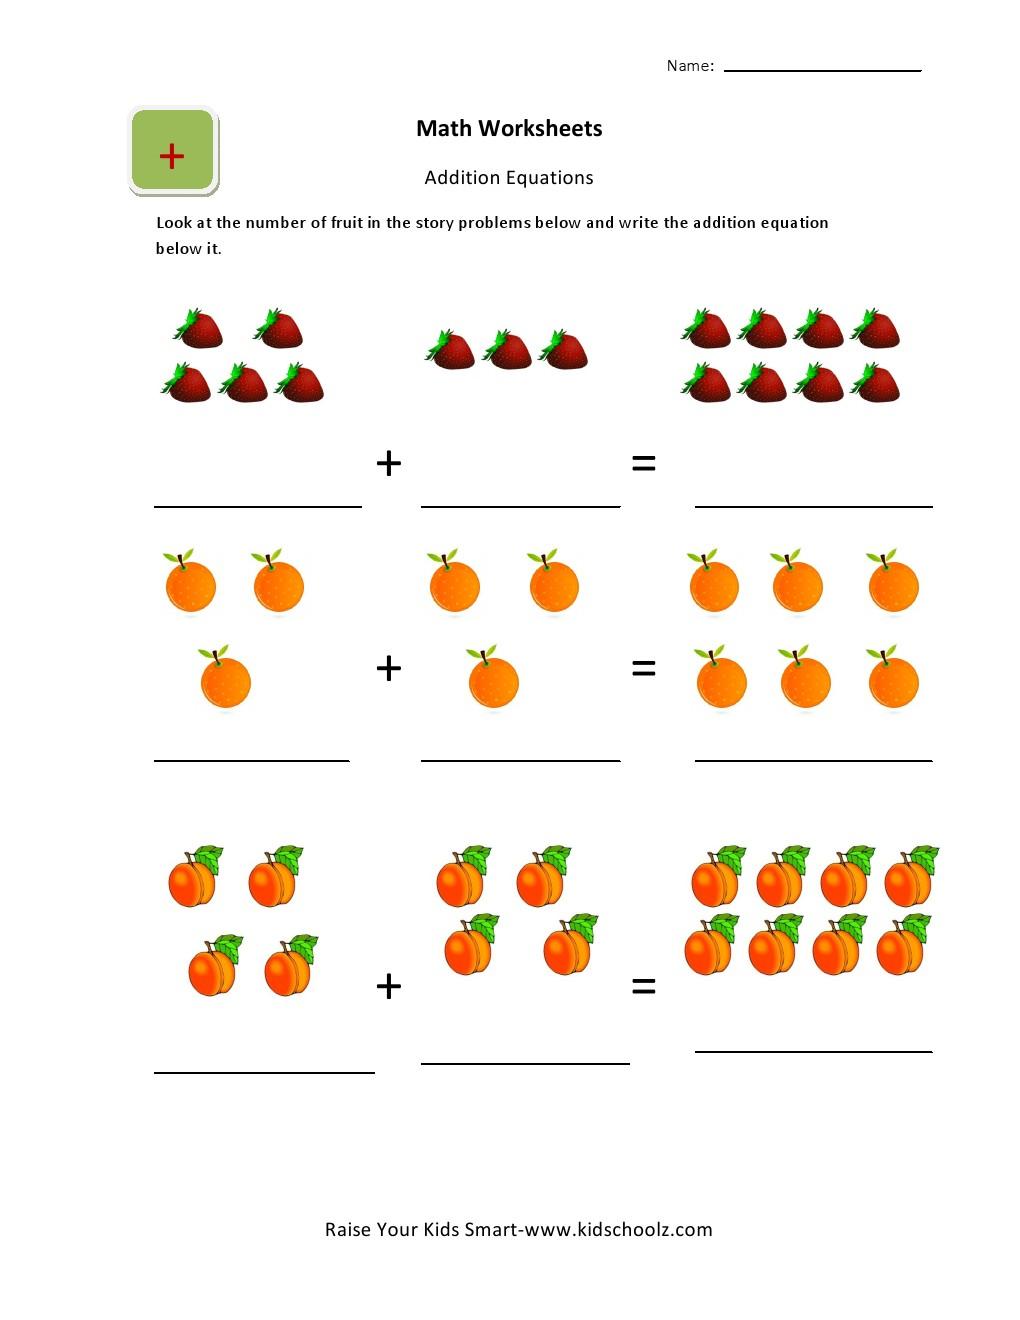 Workbooks story writing worksheets for grade 1 : UKG-Basic Picture Addition Worksheets for Kids - Kidschoolz